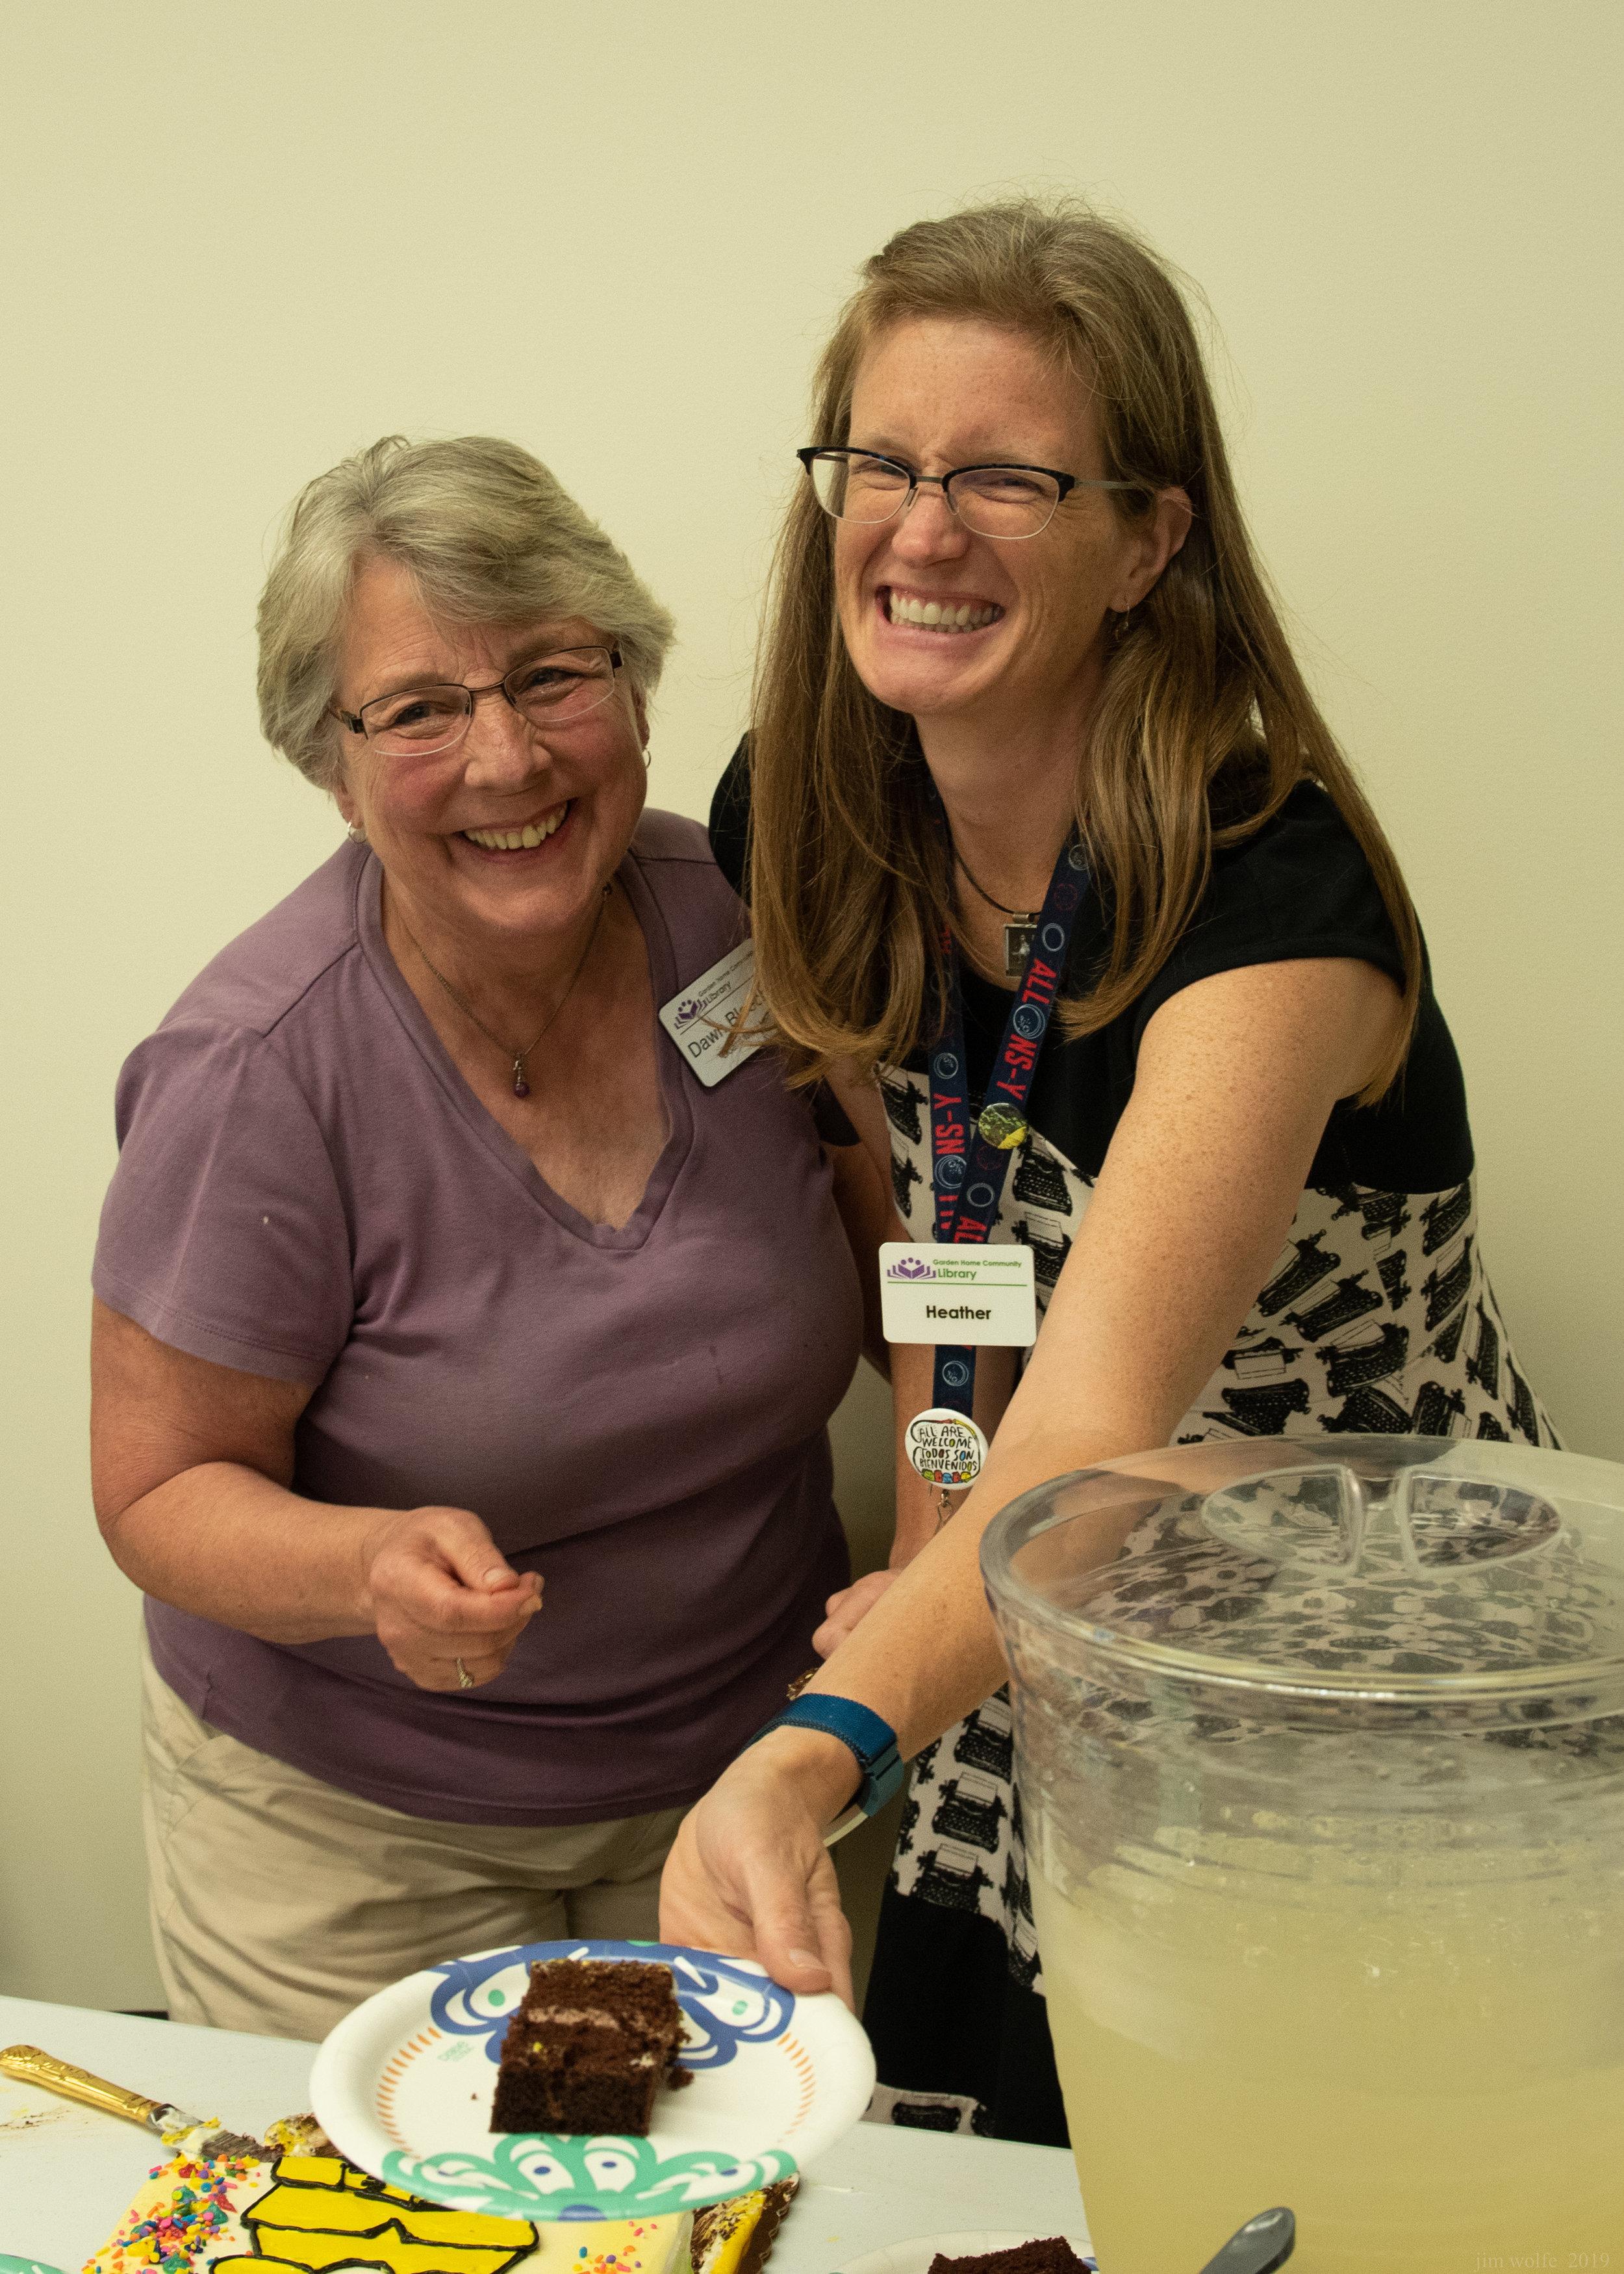 Board Member Dawn Bloechel and Staff Member Heather Waisanen serve cake and lemonade.